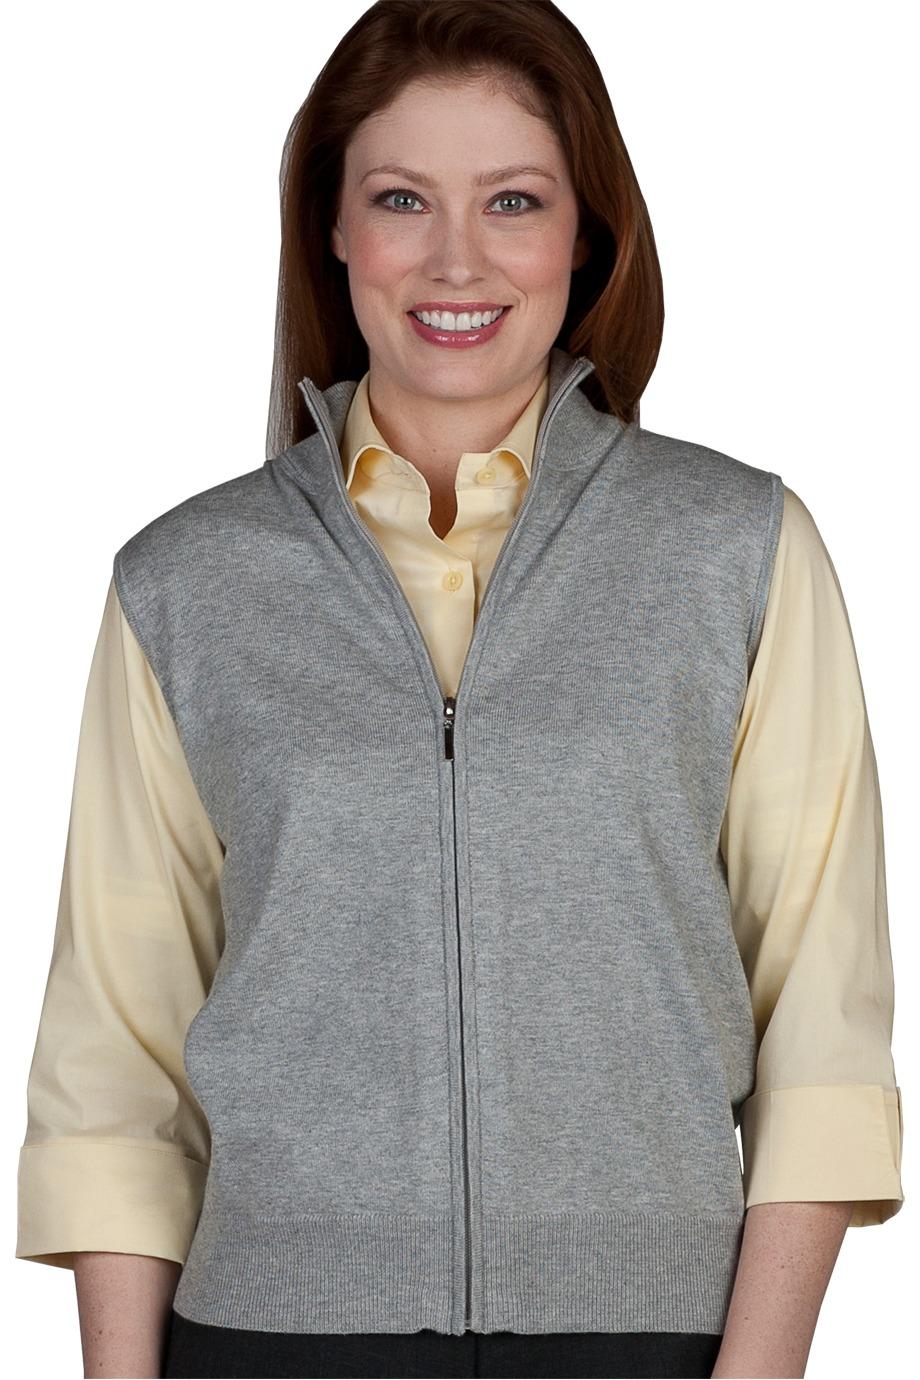 Edwards Garment 063 女士全拉链开襟羊毛衫马甲背心